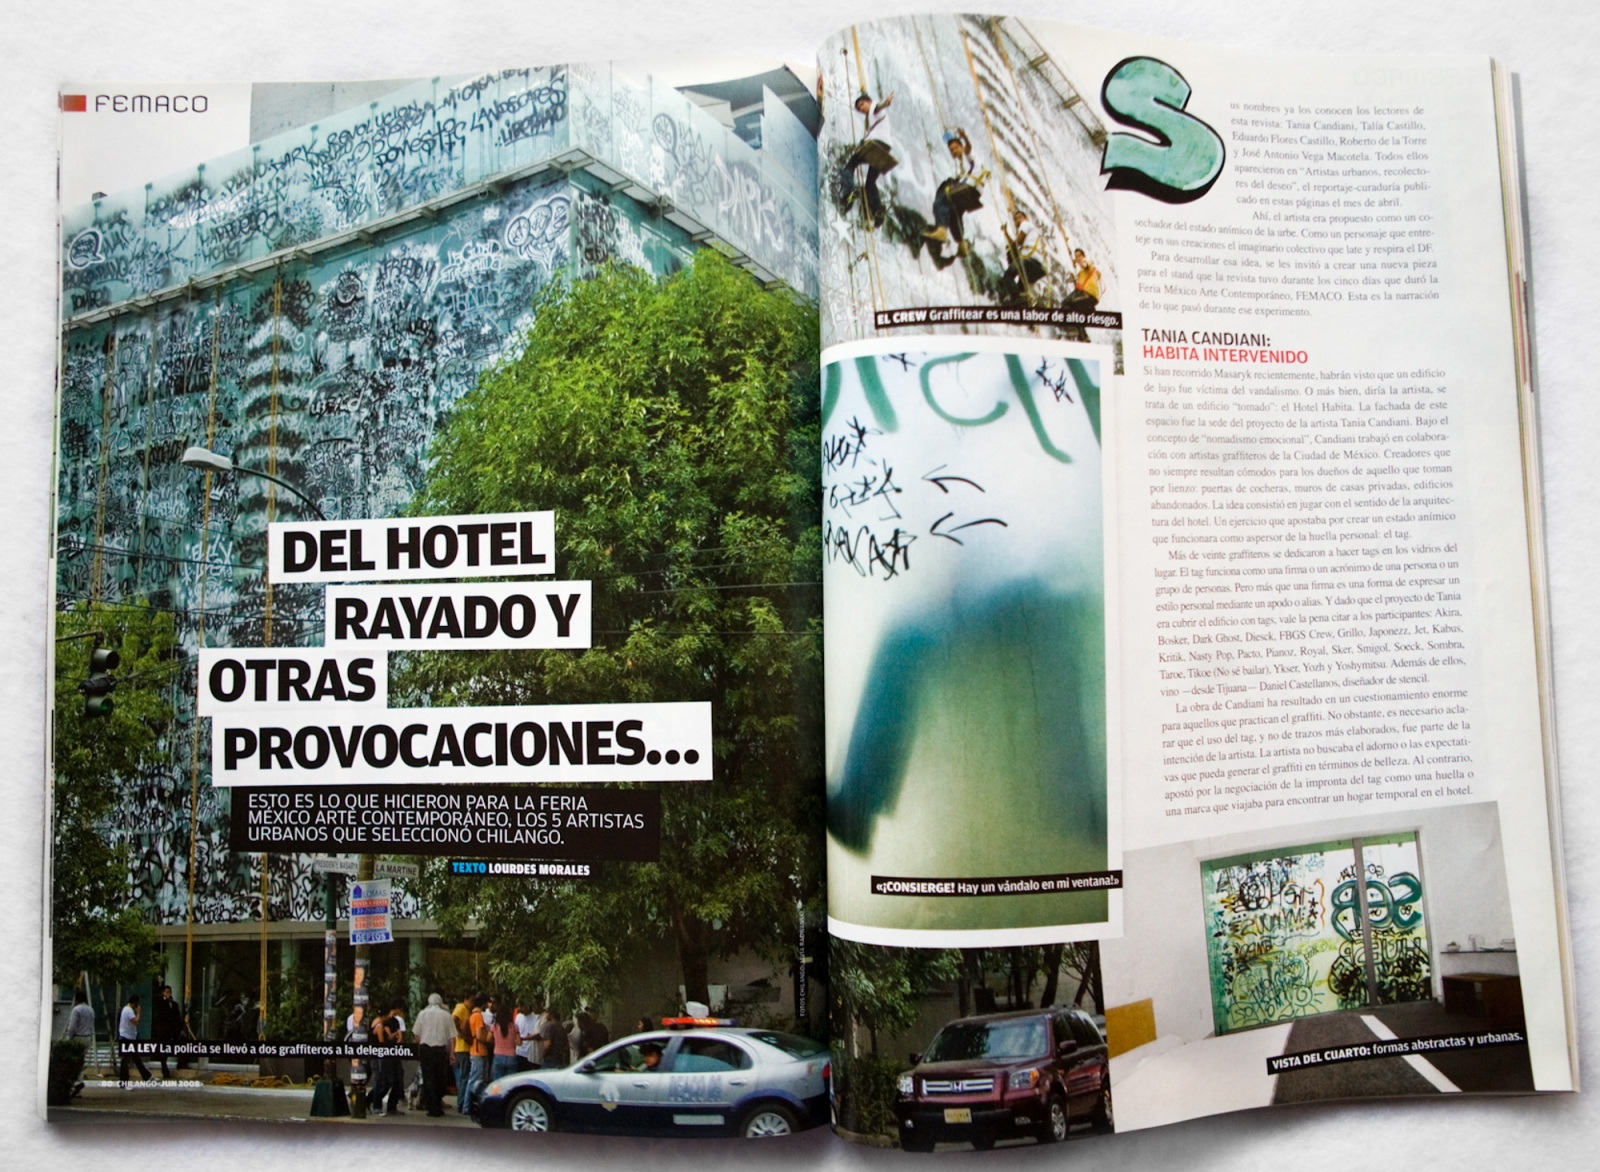 Chilango Magazine / Revista Chilango. Ed. Expansión. 2008. Mexico.